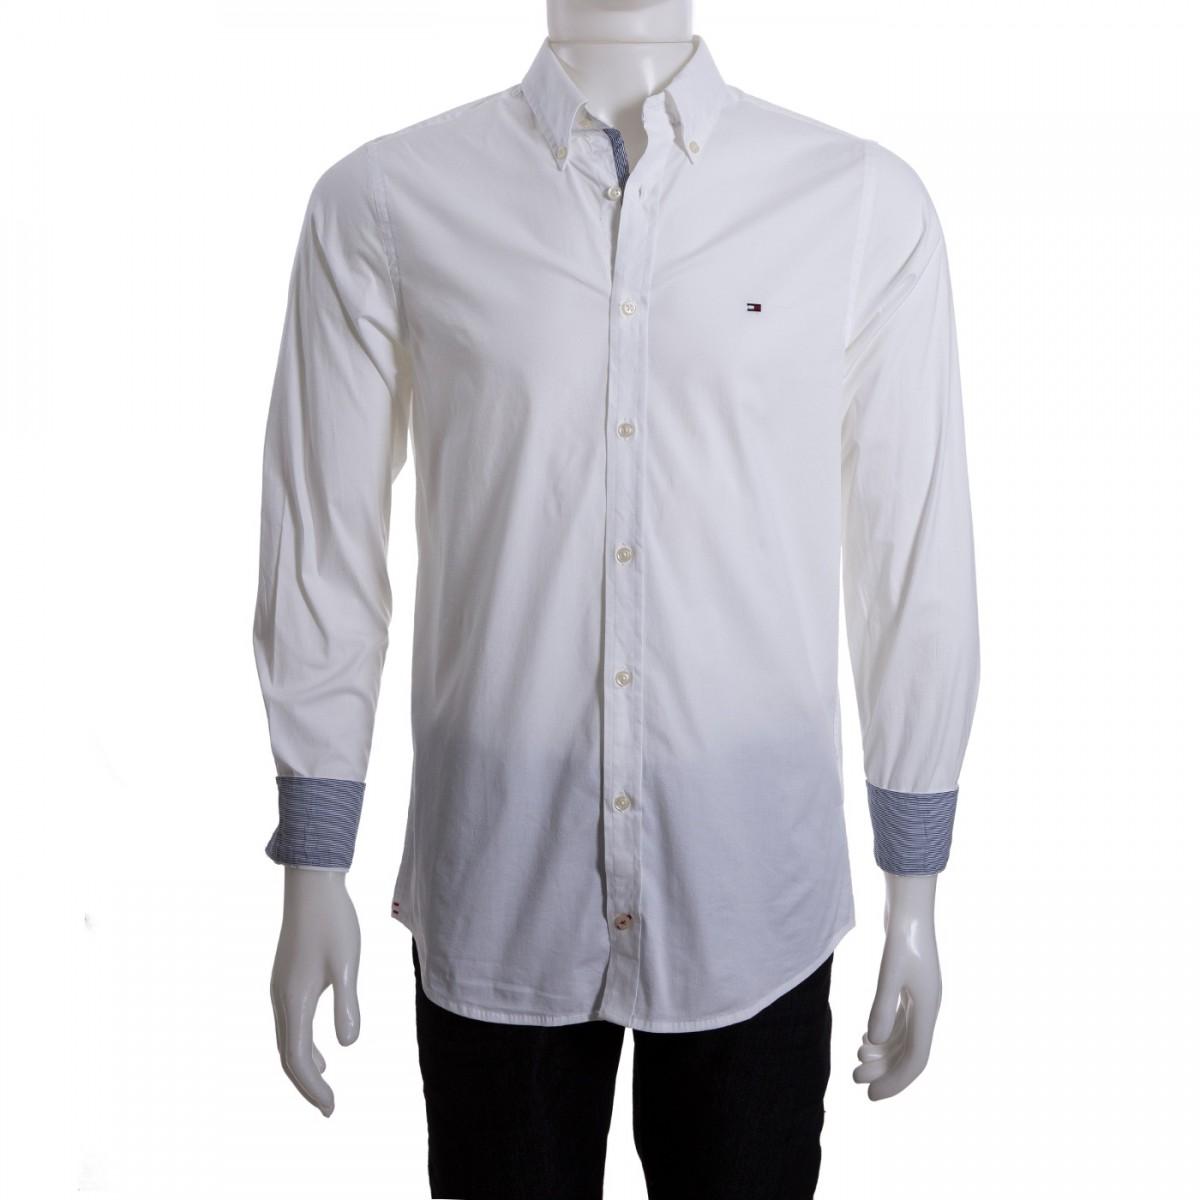 ff5748d39f Camisa Social Masculina Tommy Hilfiger Slim Th0857872321 - Branco ...